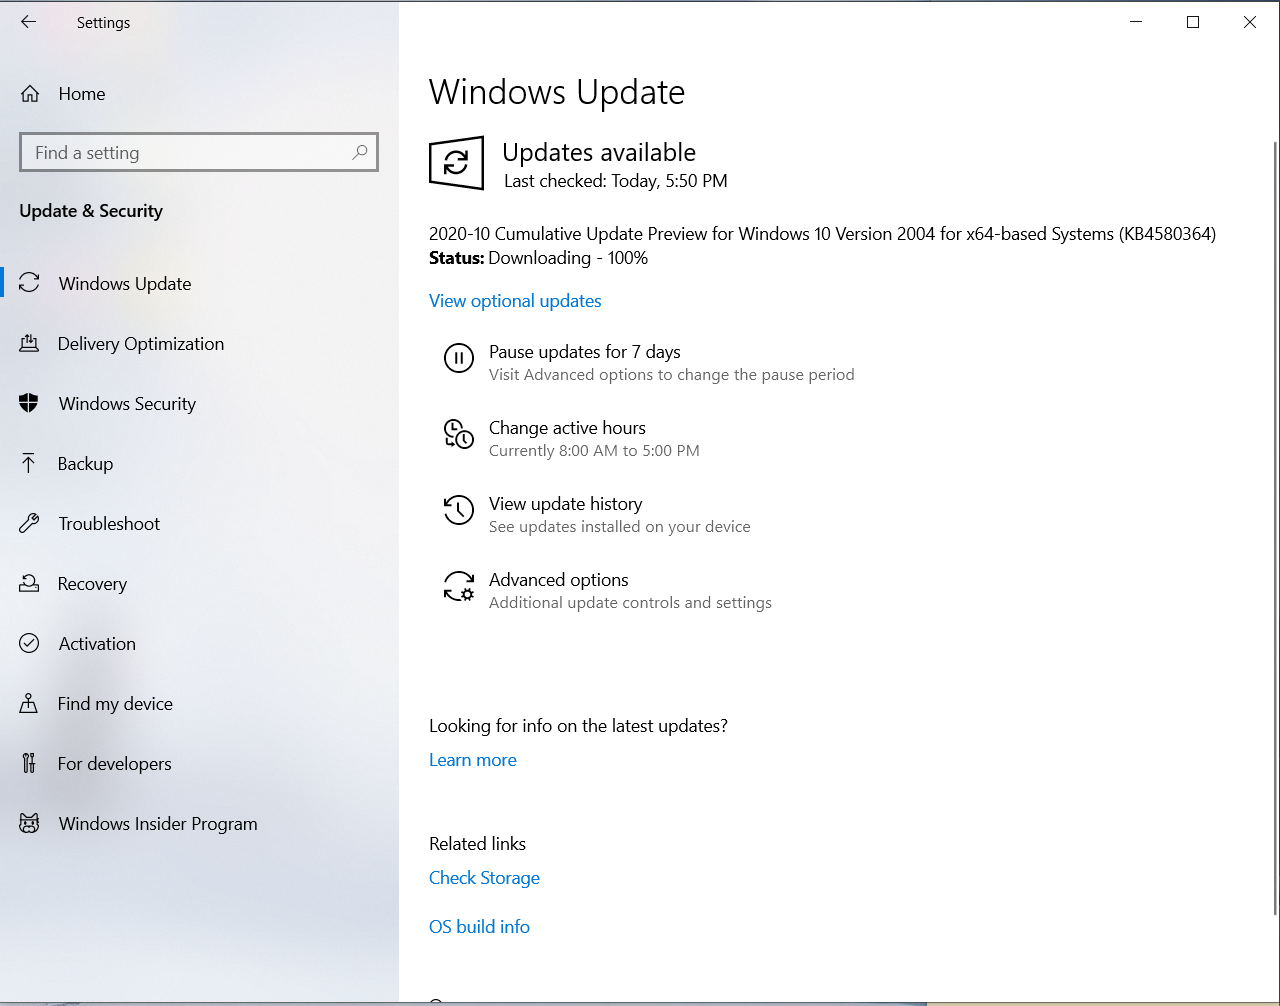 2020-10 Windows update stuck at 100% 37e45d5c-feb4-4758-af70-e368686cd7fd?upload=true.png